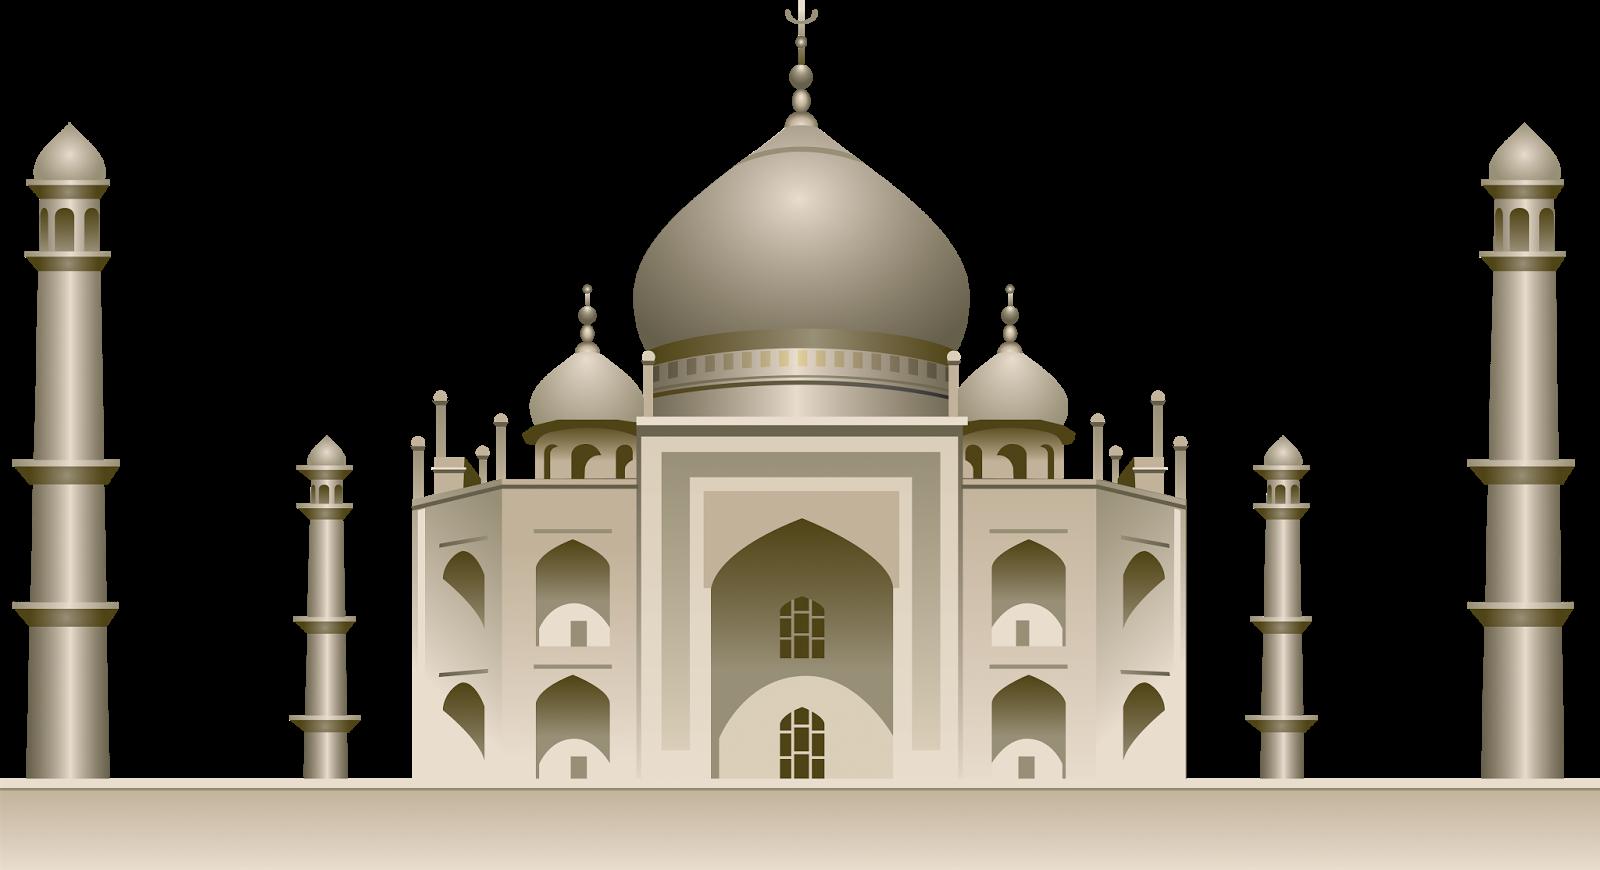 1600x870 Taj Mahal Png Transparent Vector Images Free Online Ping Files